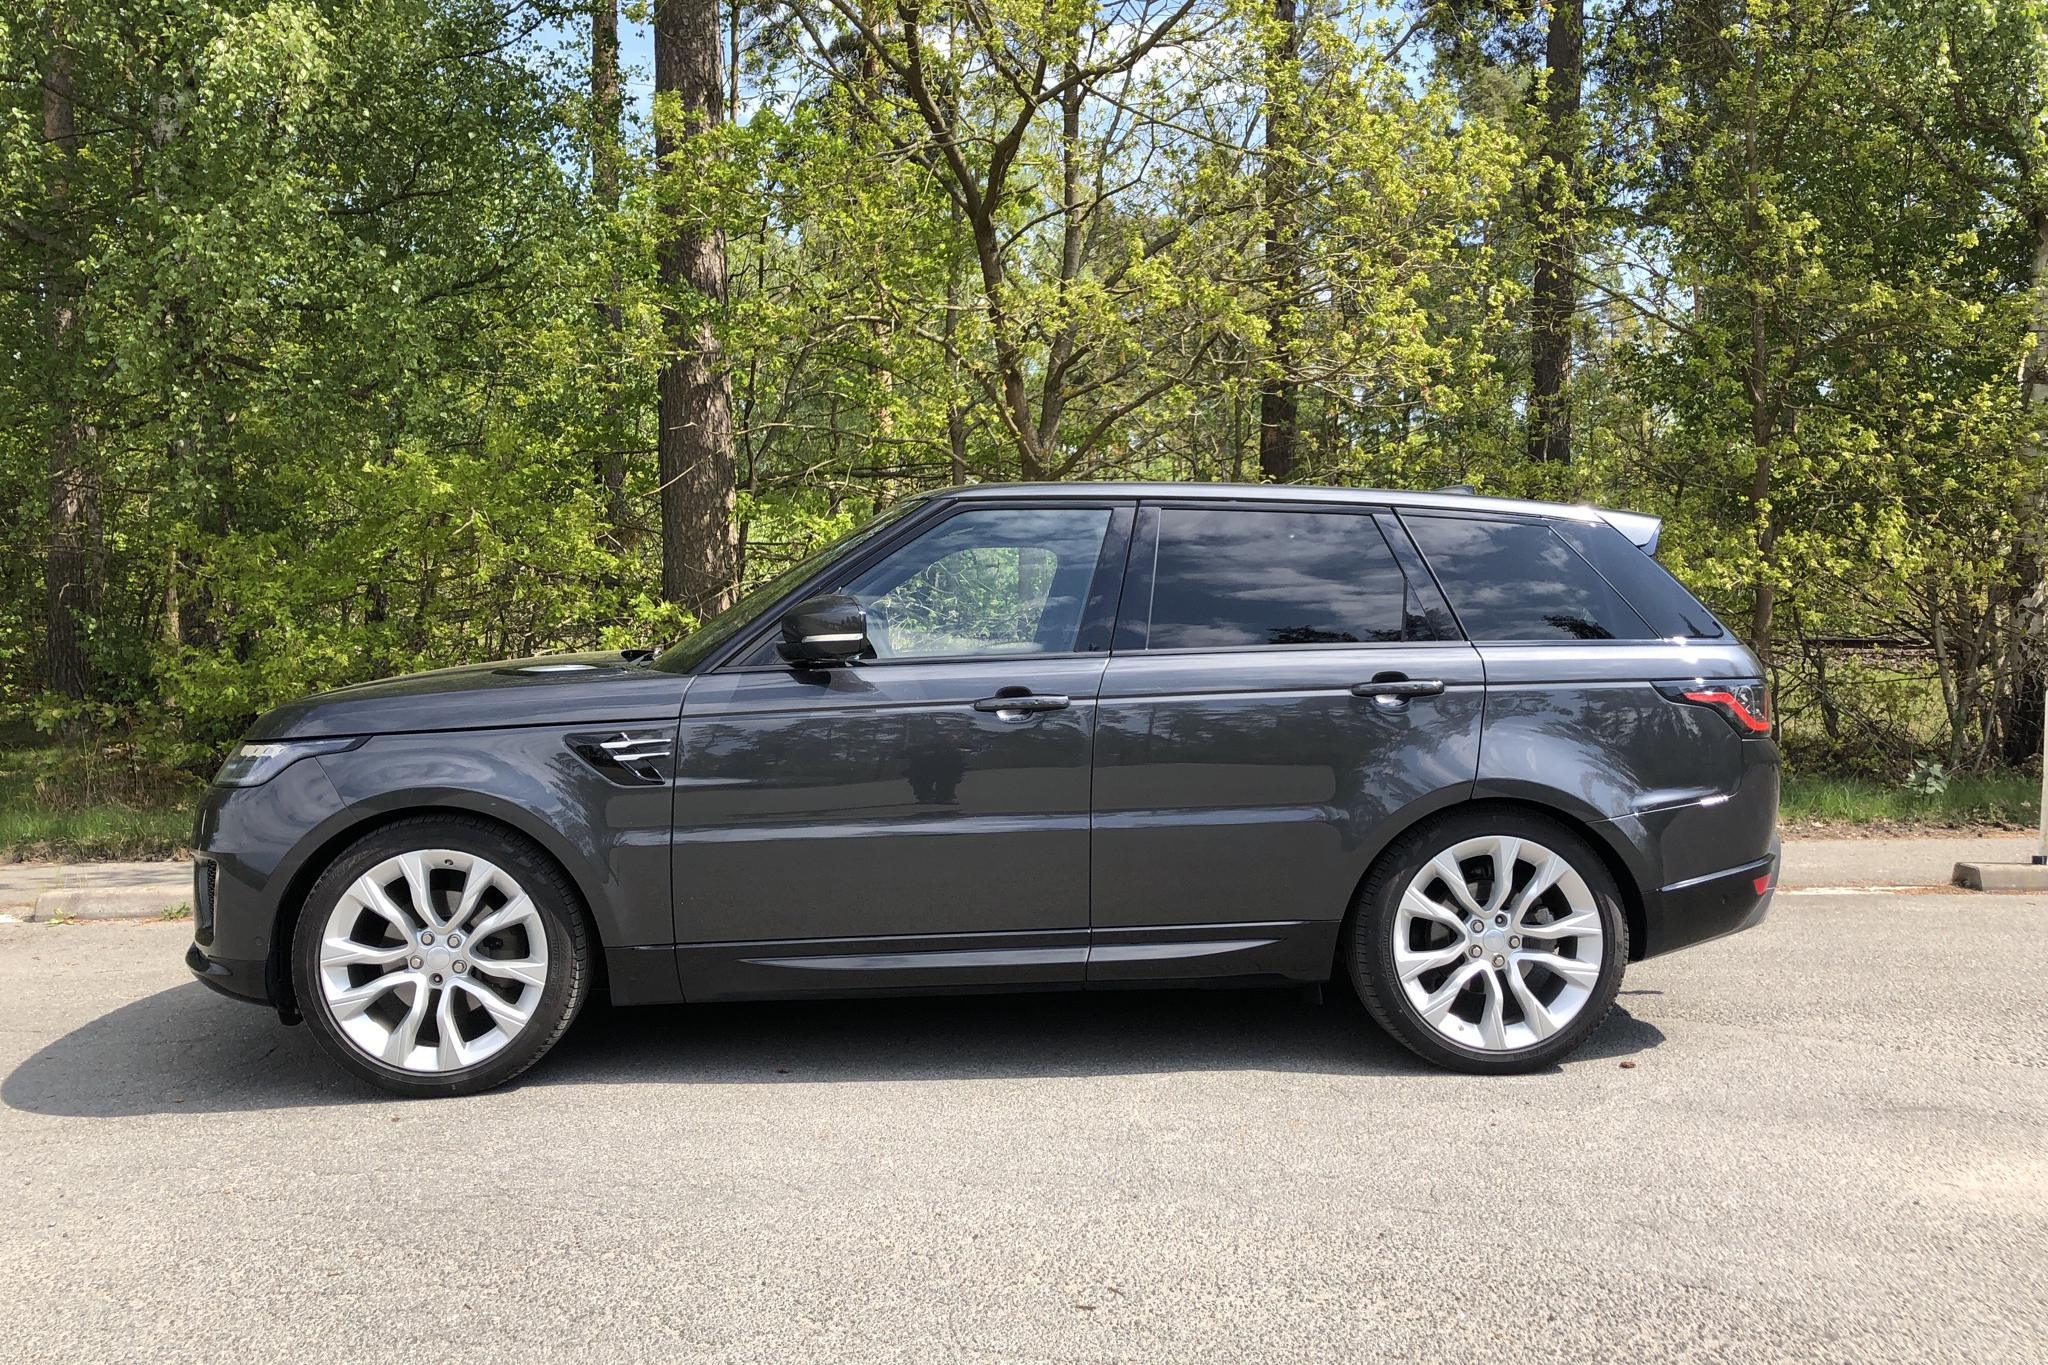 Land Rover Range Rover Sport 3.0 SDV6 (306hk) - 116 690 km - Automatic - gray - 2019